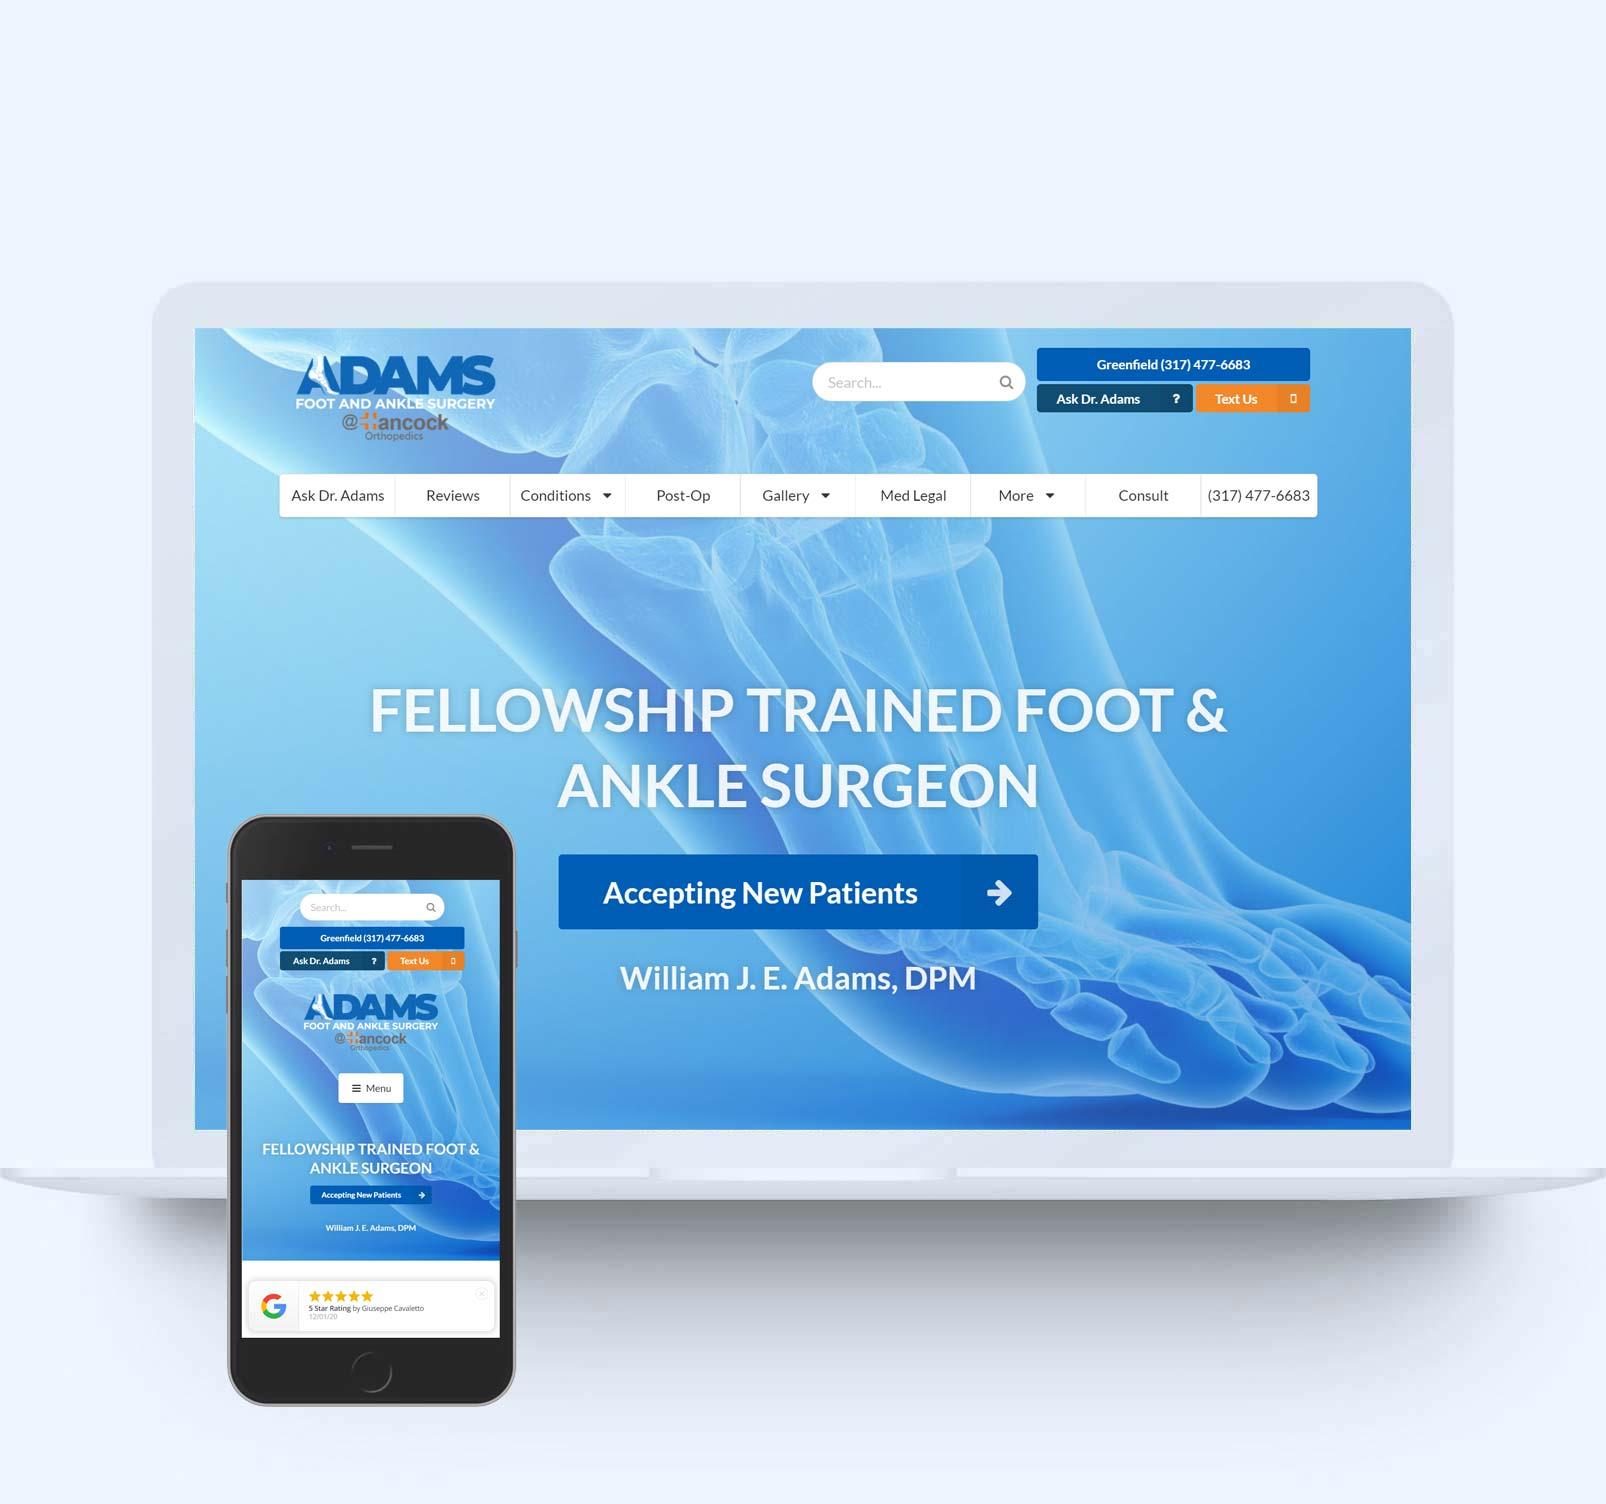 adams-foot-ankle-surgery-website-design